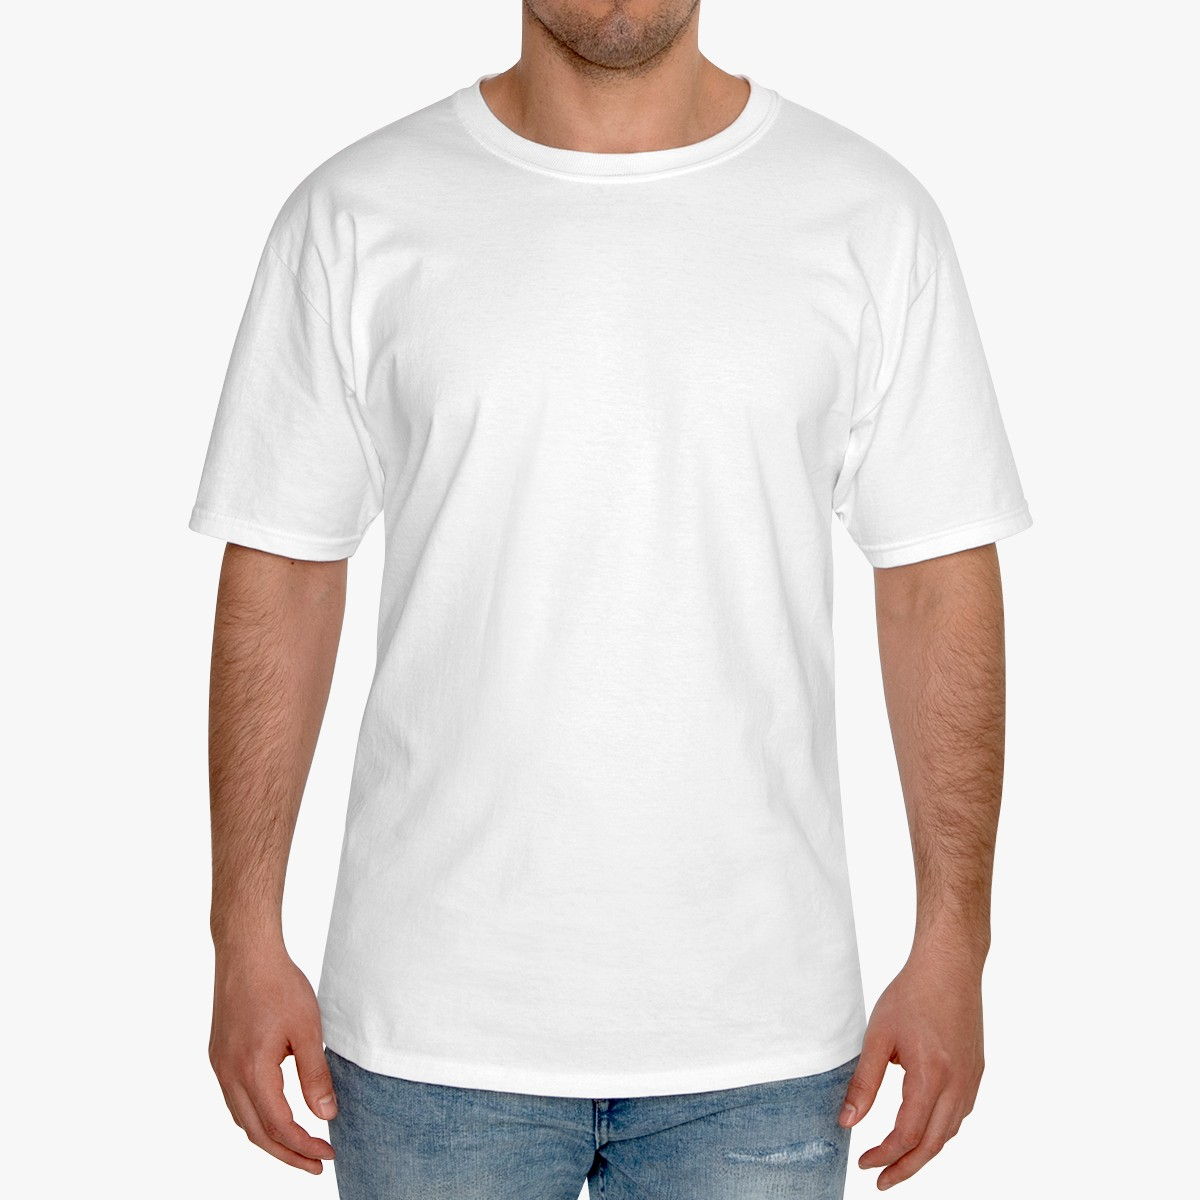 Print On Demand Champion T-shirts Mens T-shirt